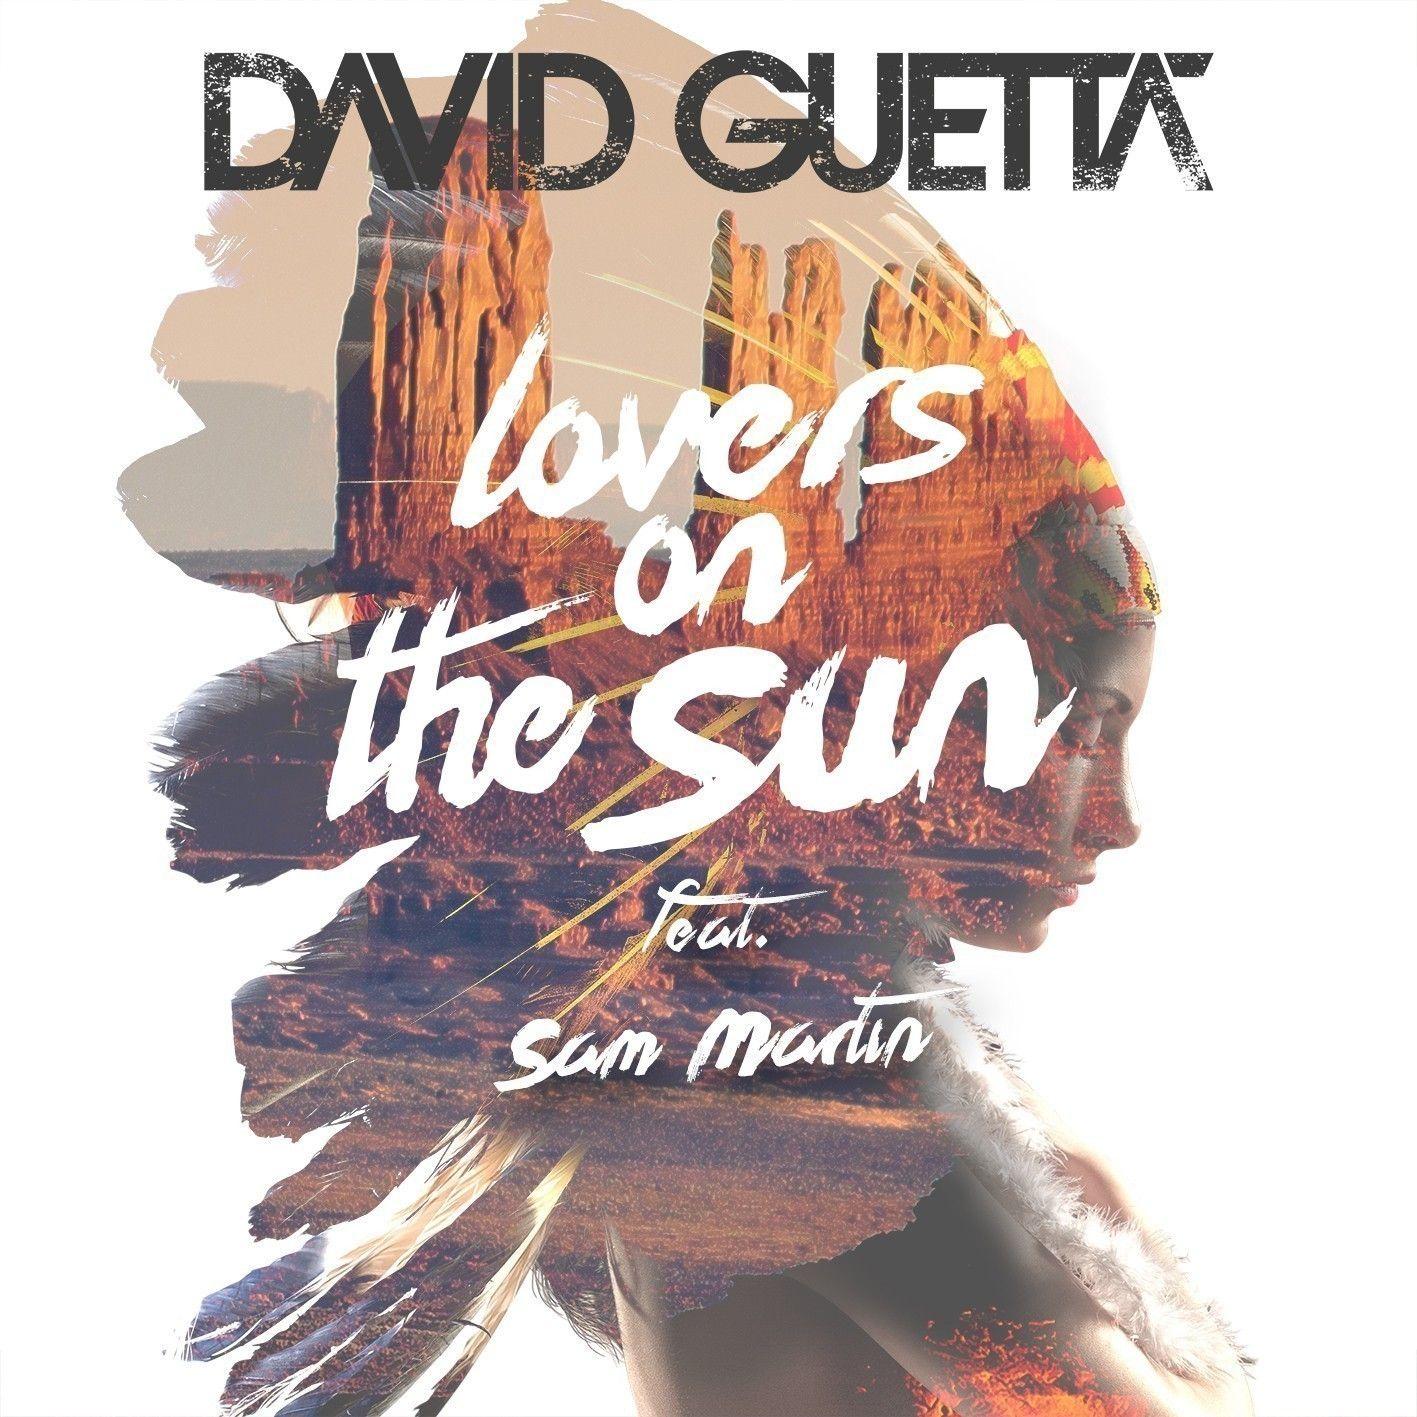 david-guetta-lovers-sun-packshot.jpg